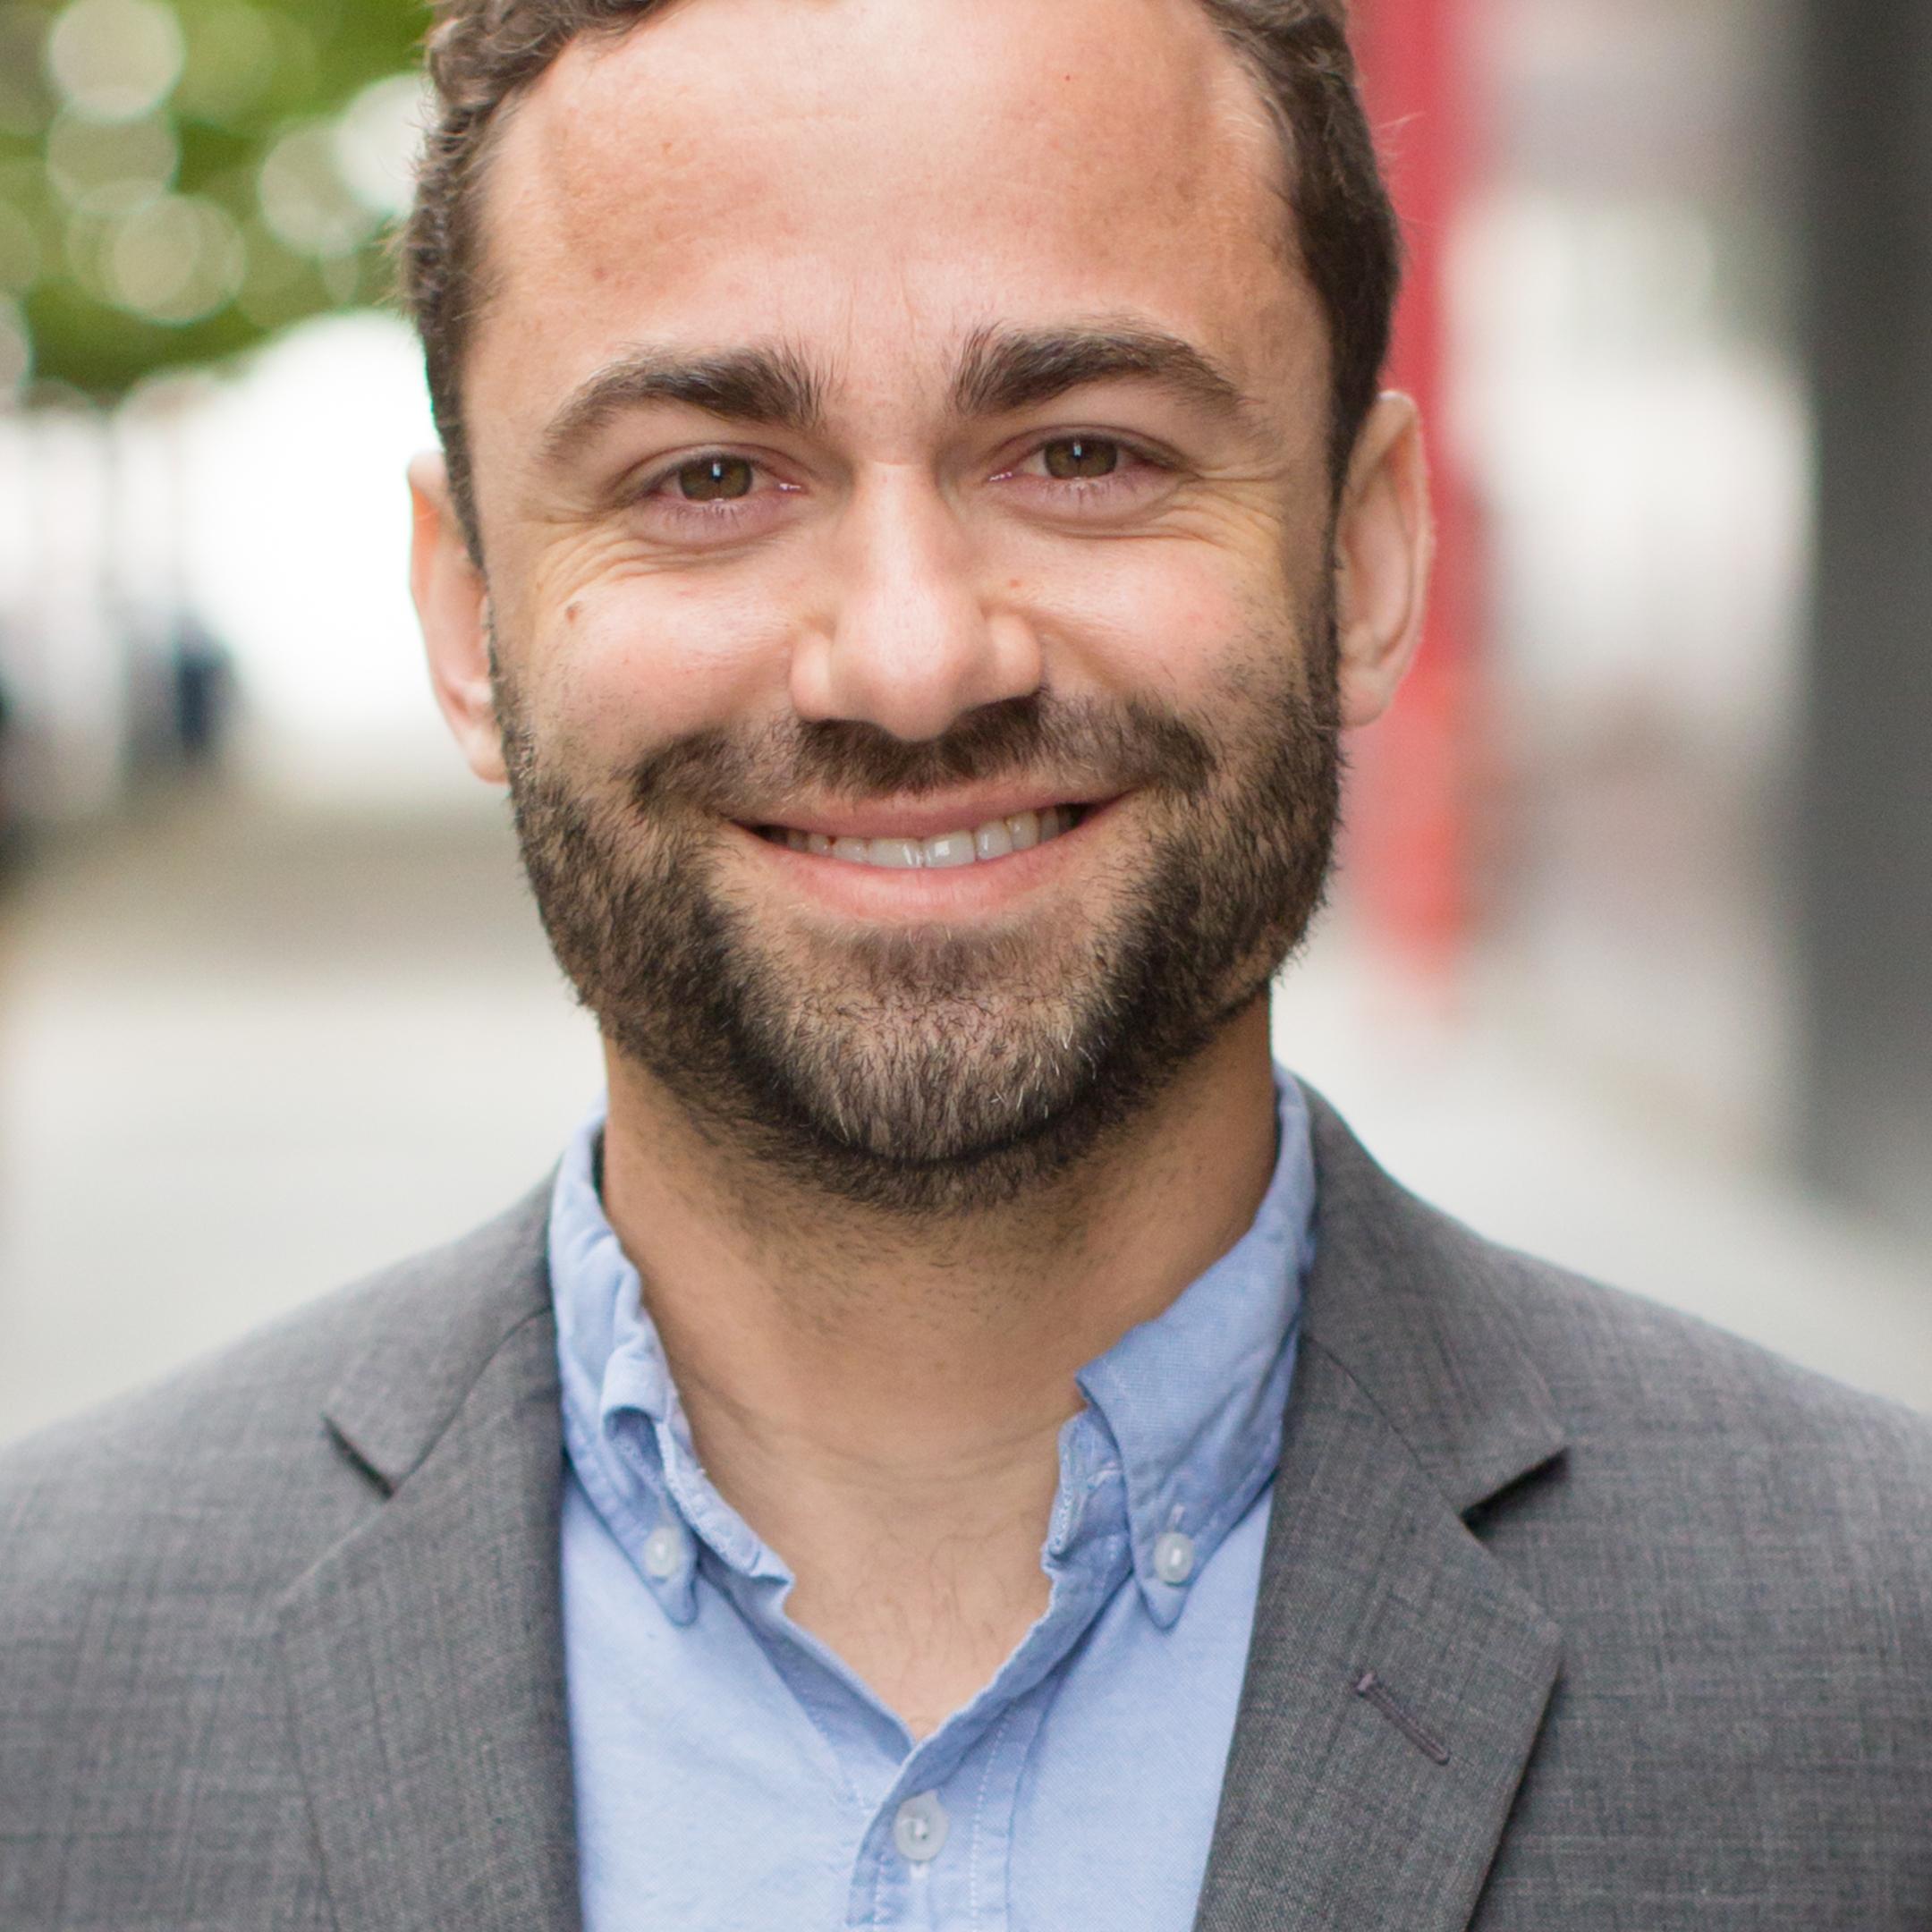 Remitly: See Startup Grind Hosts Matt Oppenheimer CEO, Founder